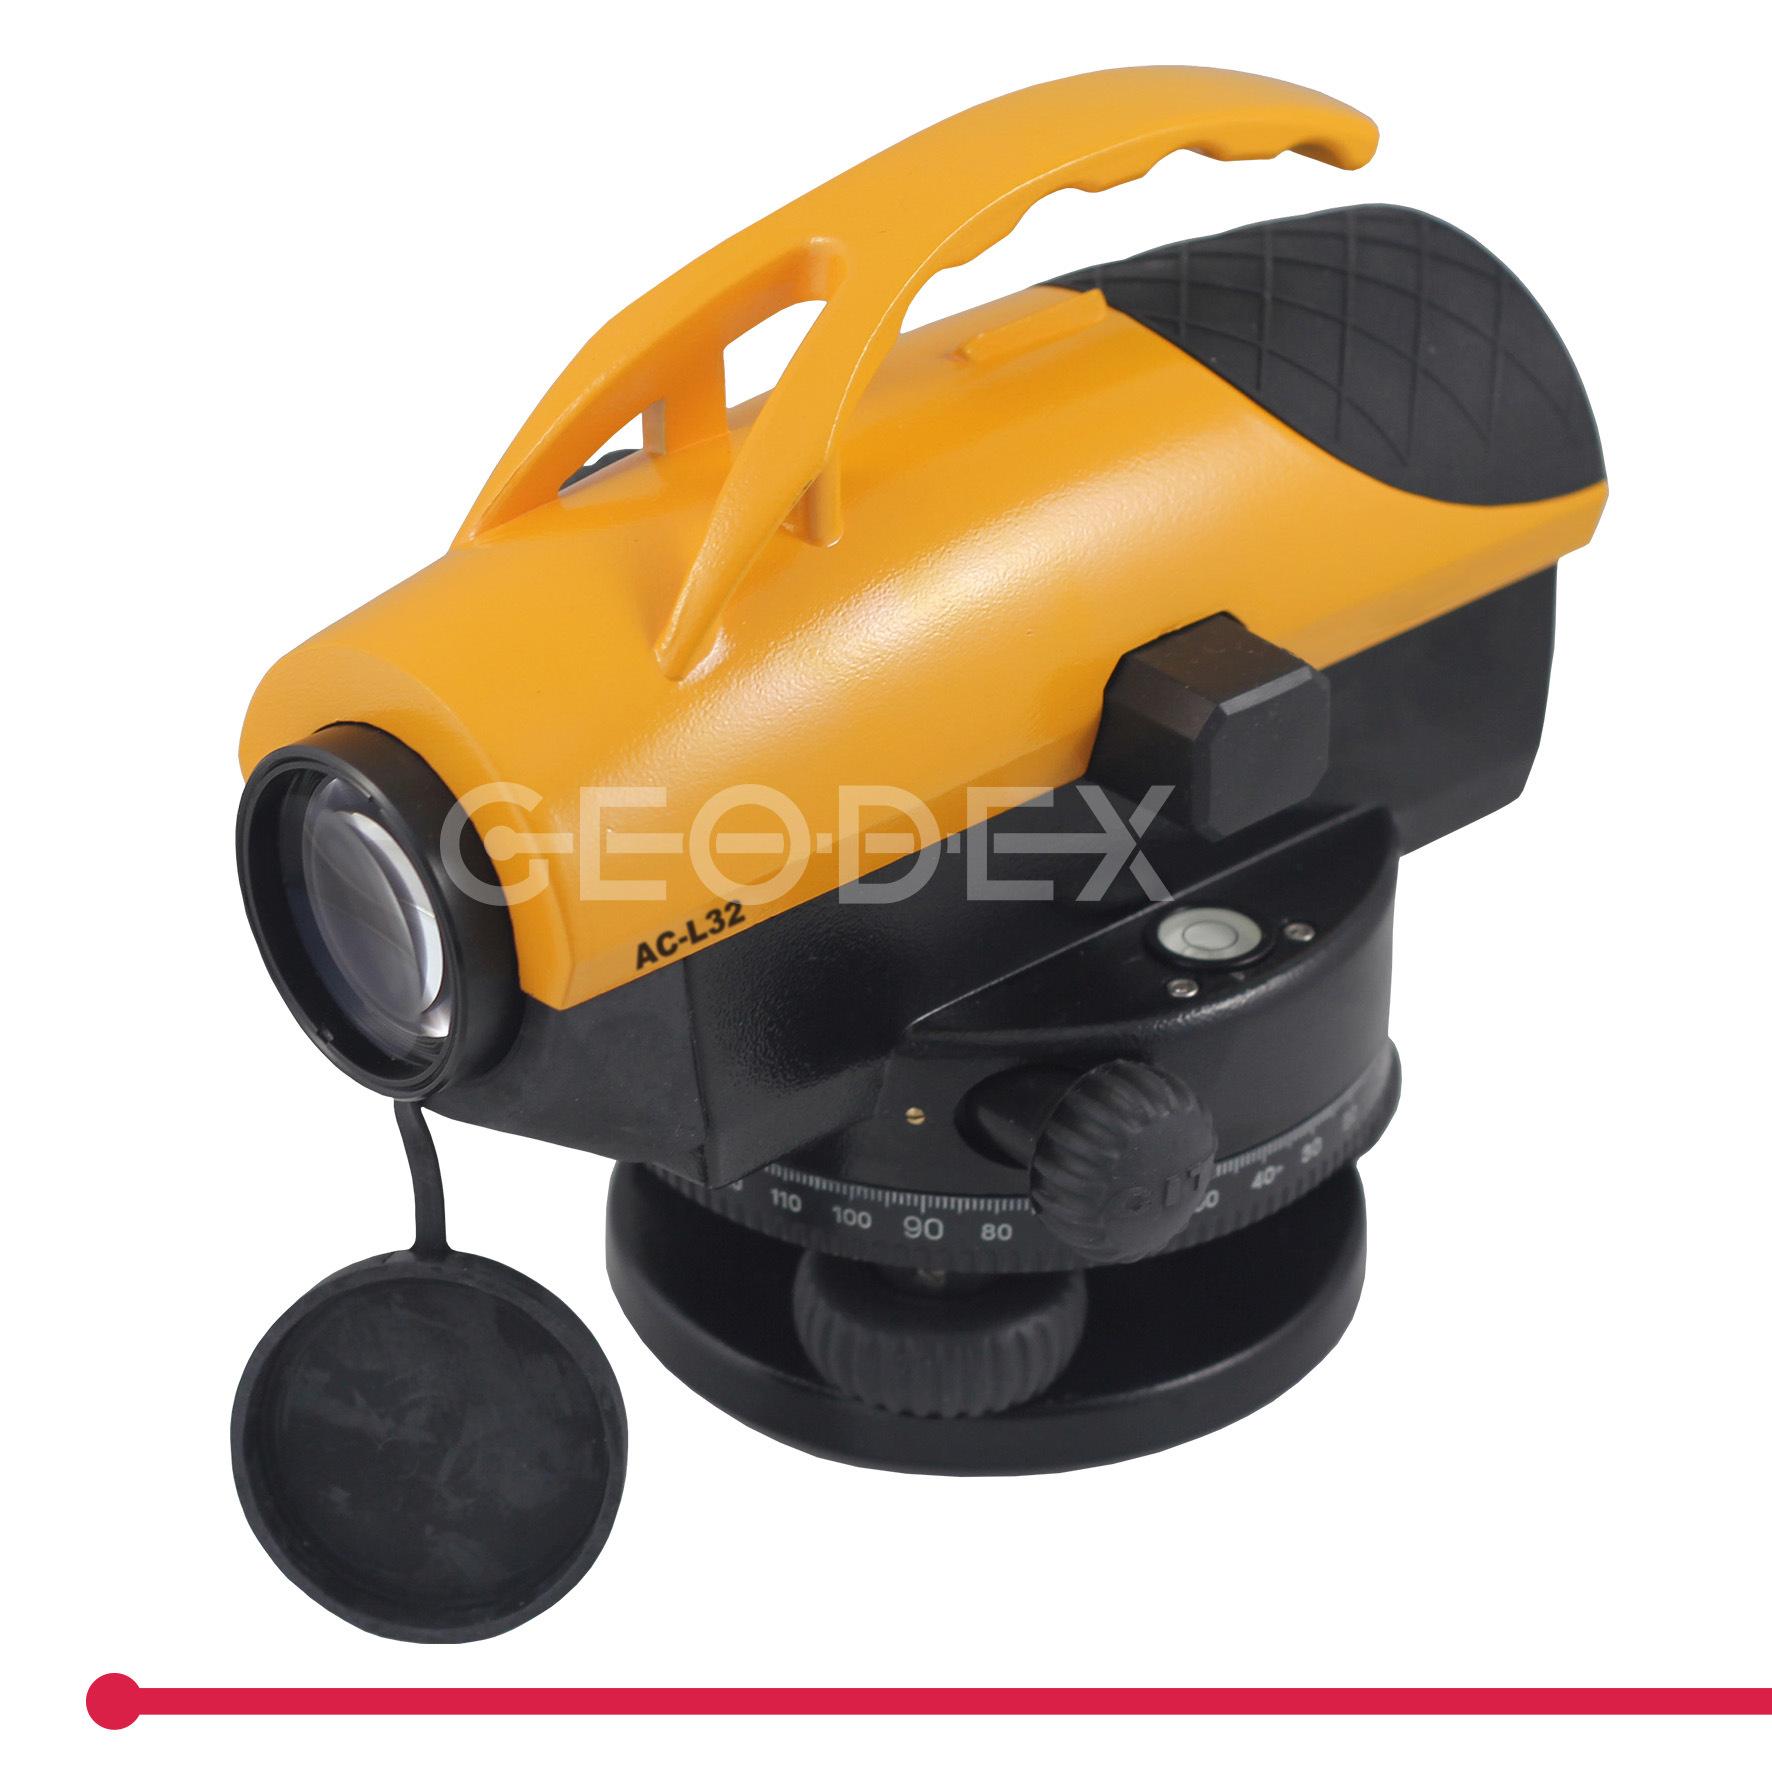 Automatic Self-Leveling AC-L32 32X Surveying Instruments with Unique Handle Design